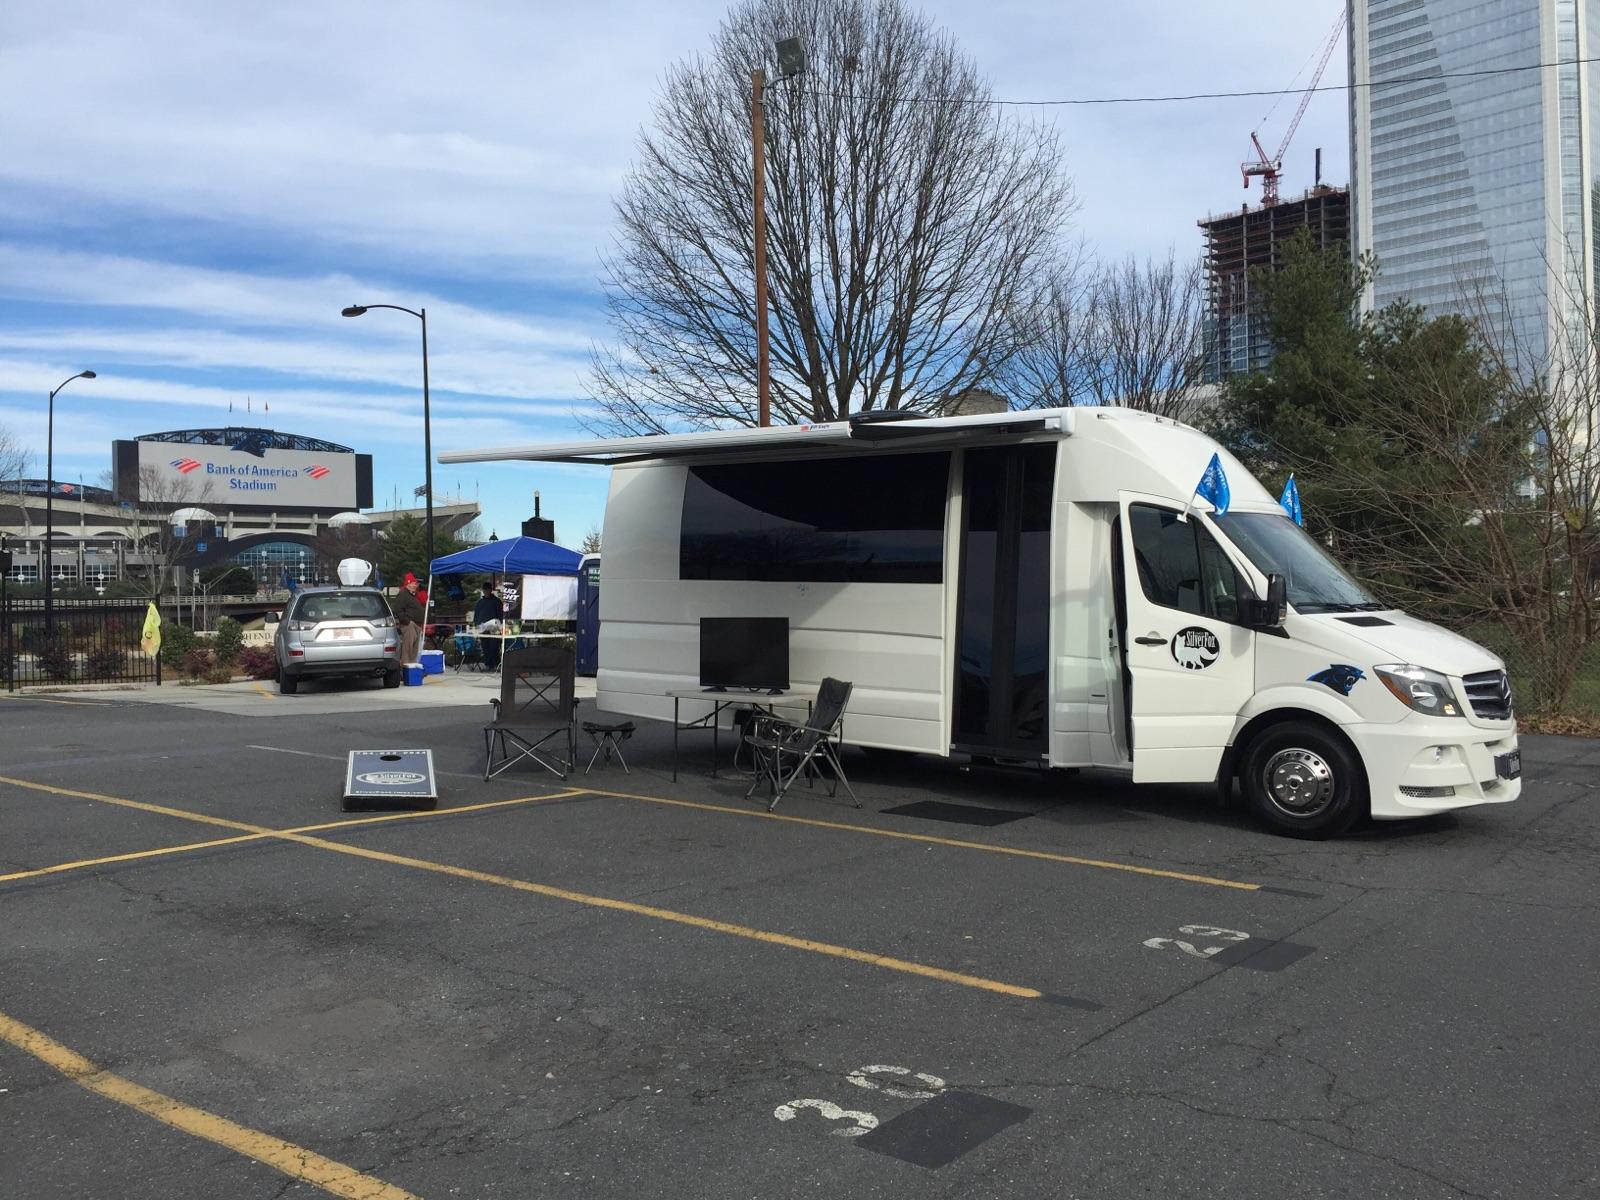 15 Passenger 2015 Sprinter Limo XL – SilverFox Limos